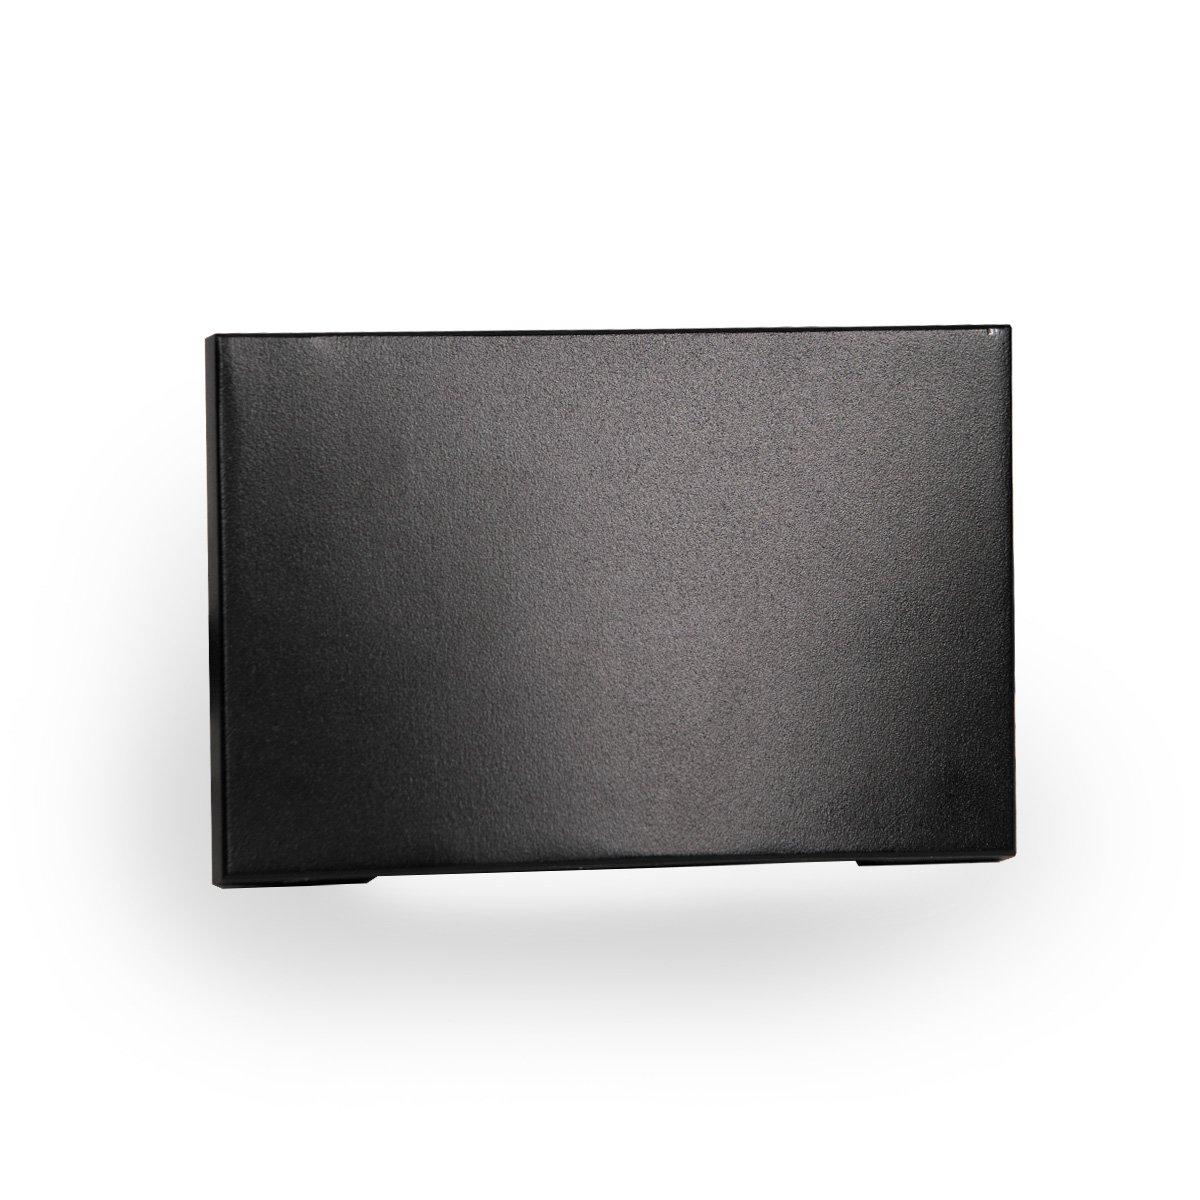 WAC Lighting WL-LED110-C-BK LED Horizontal Scoop Step and Wall Light 120V 3000K, Black